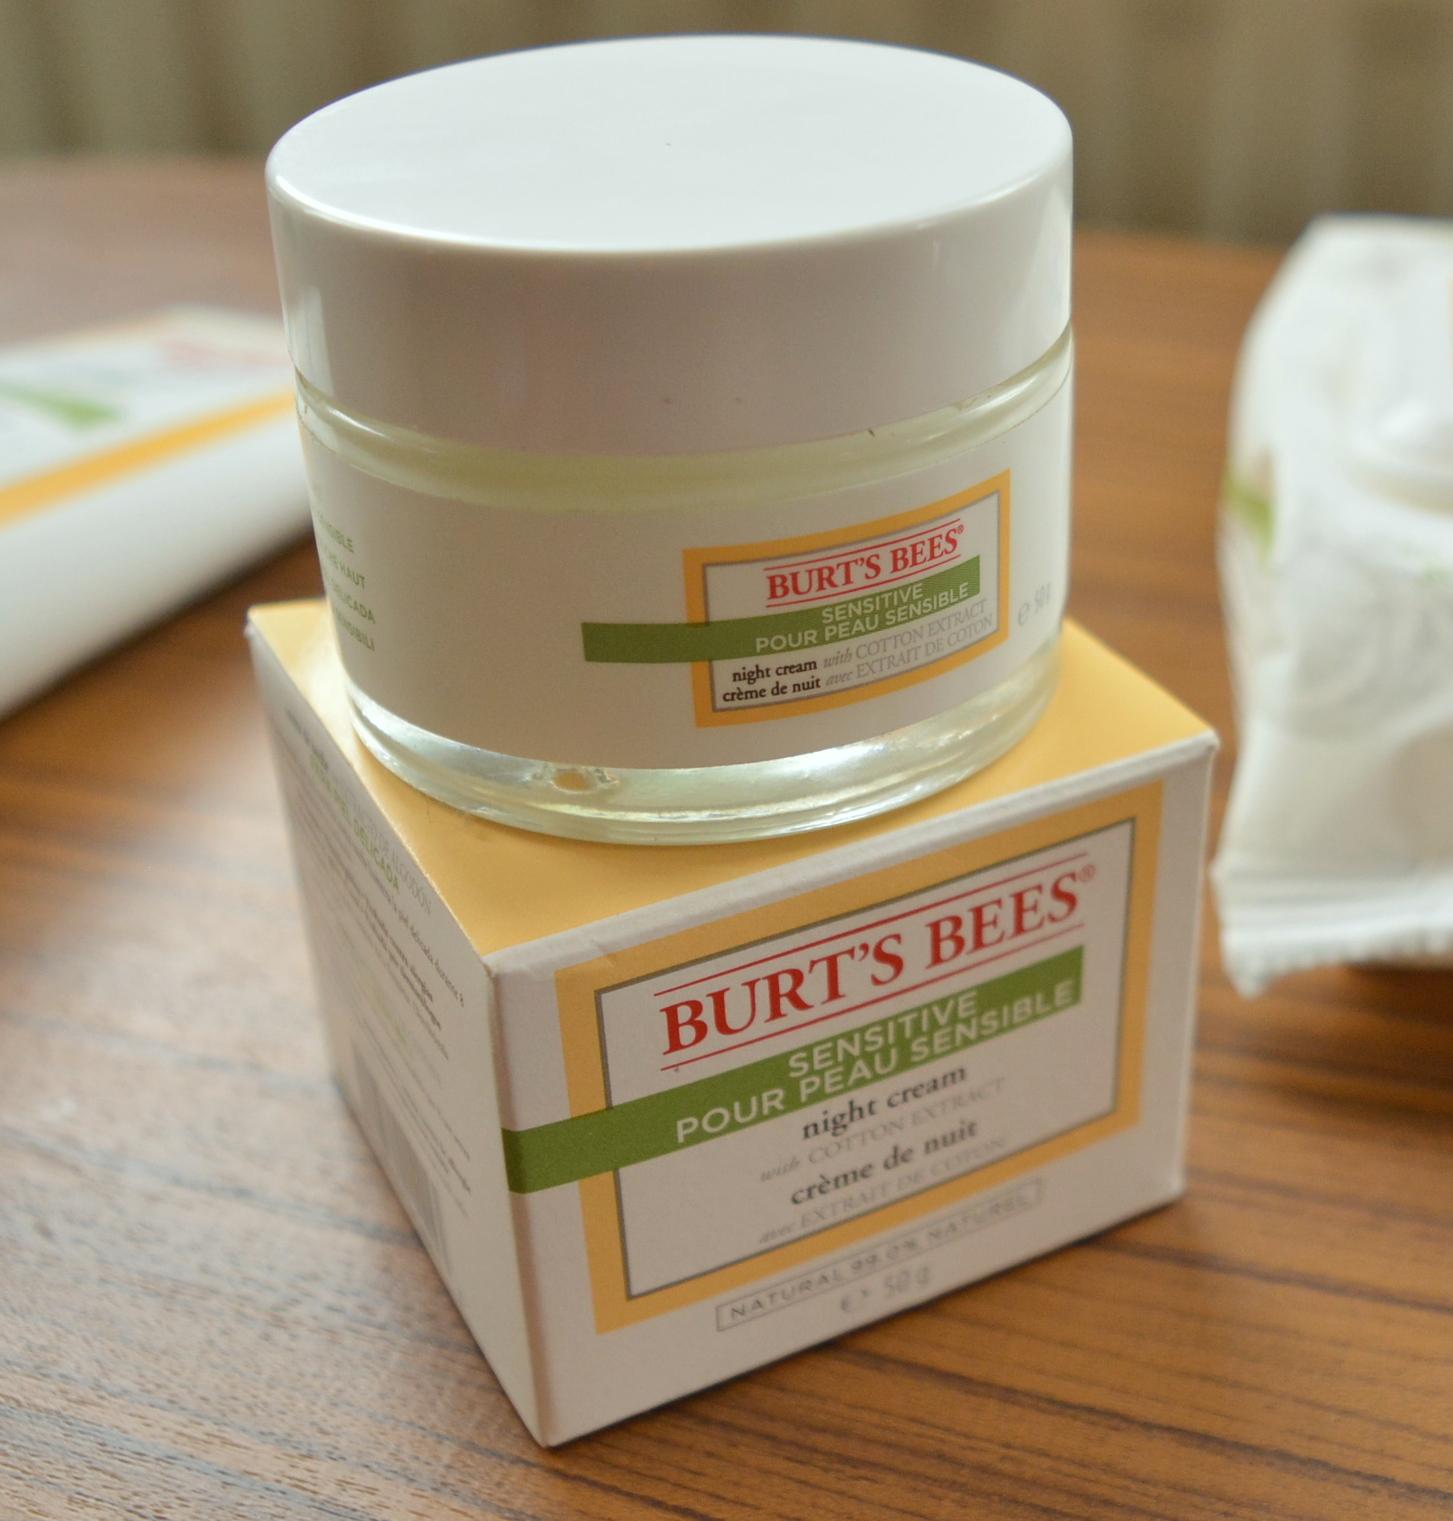 Burt's Bees Sensitive Skin Night Cream review